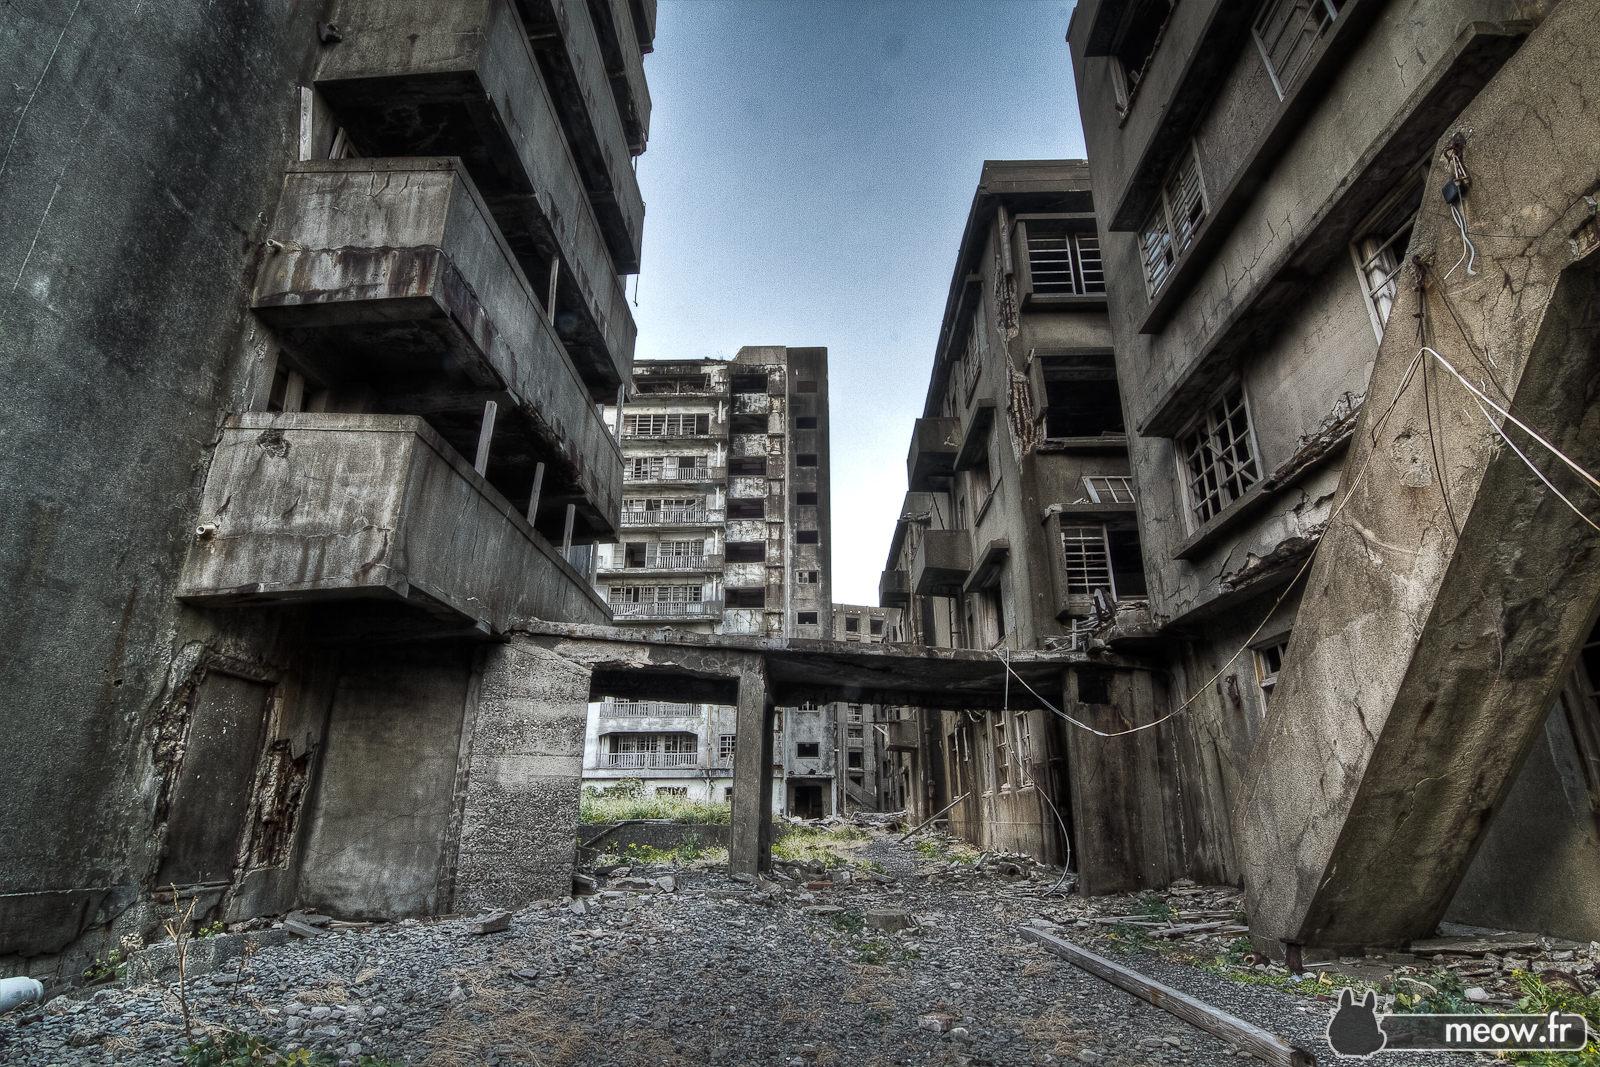 finestre rotte case vuote� ghost town � plutonia publications